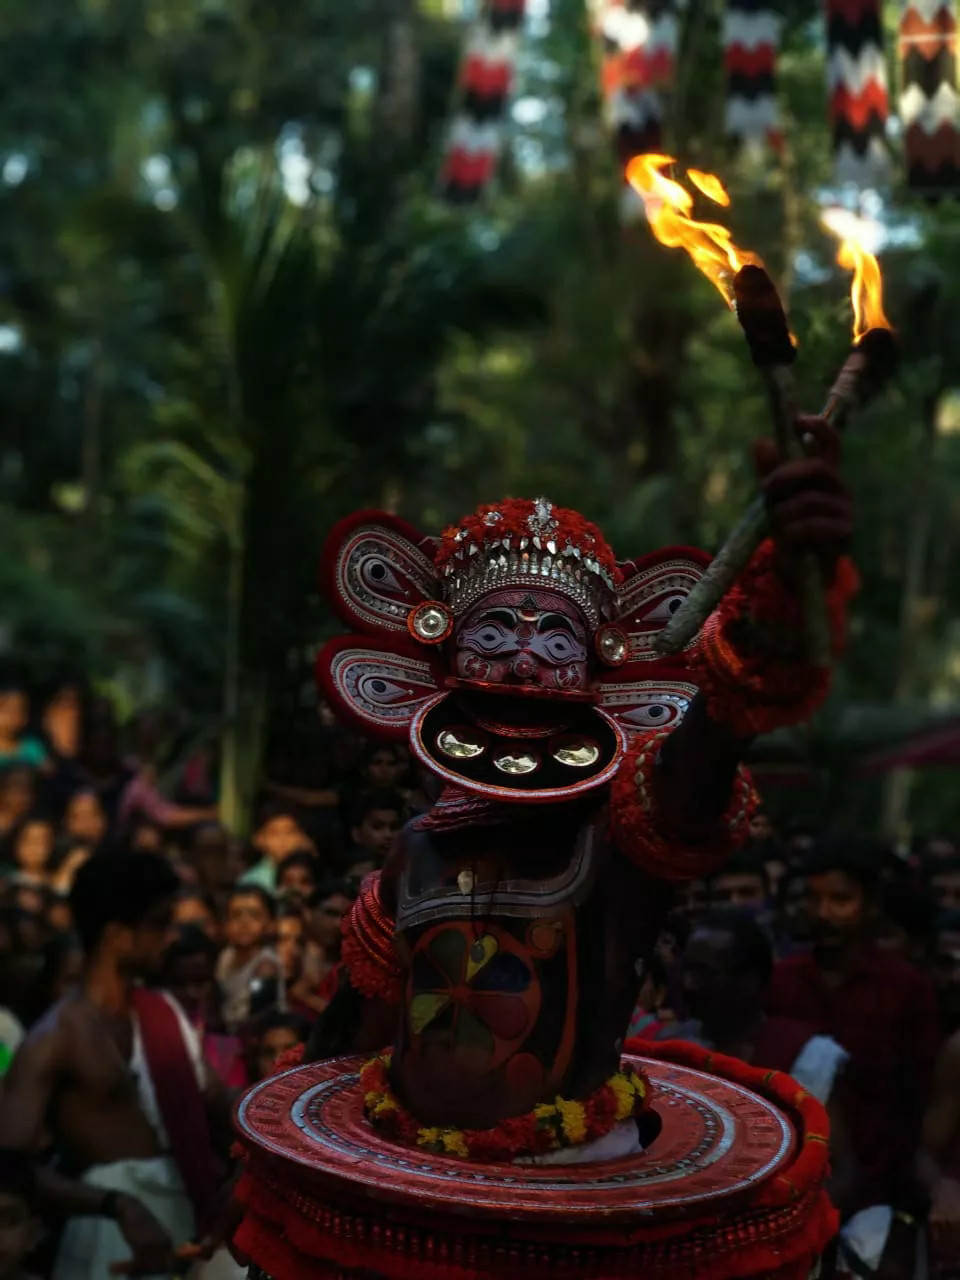 Kuttichathan Theyyam - കുട്ടിച്ചാത്തന് തെയ്യം 4